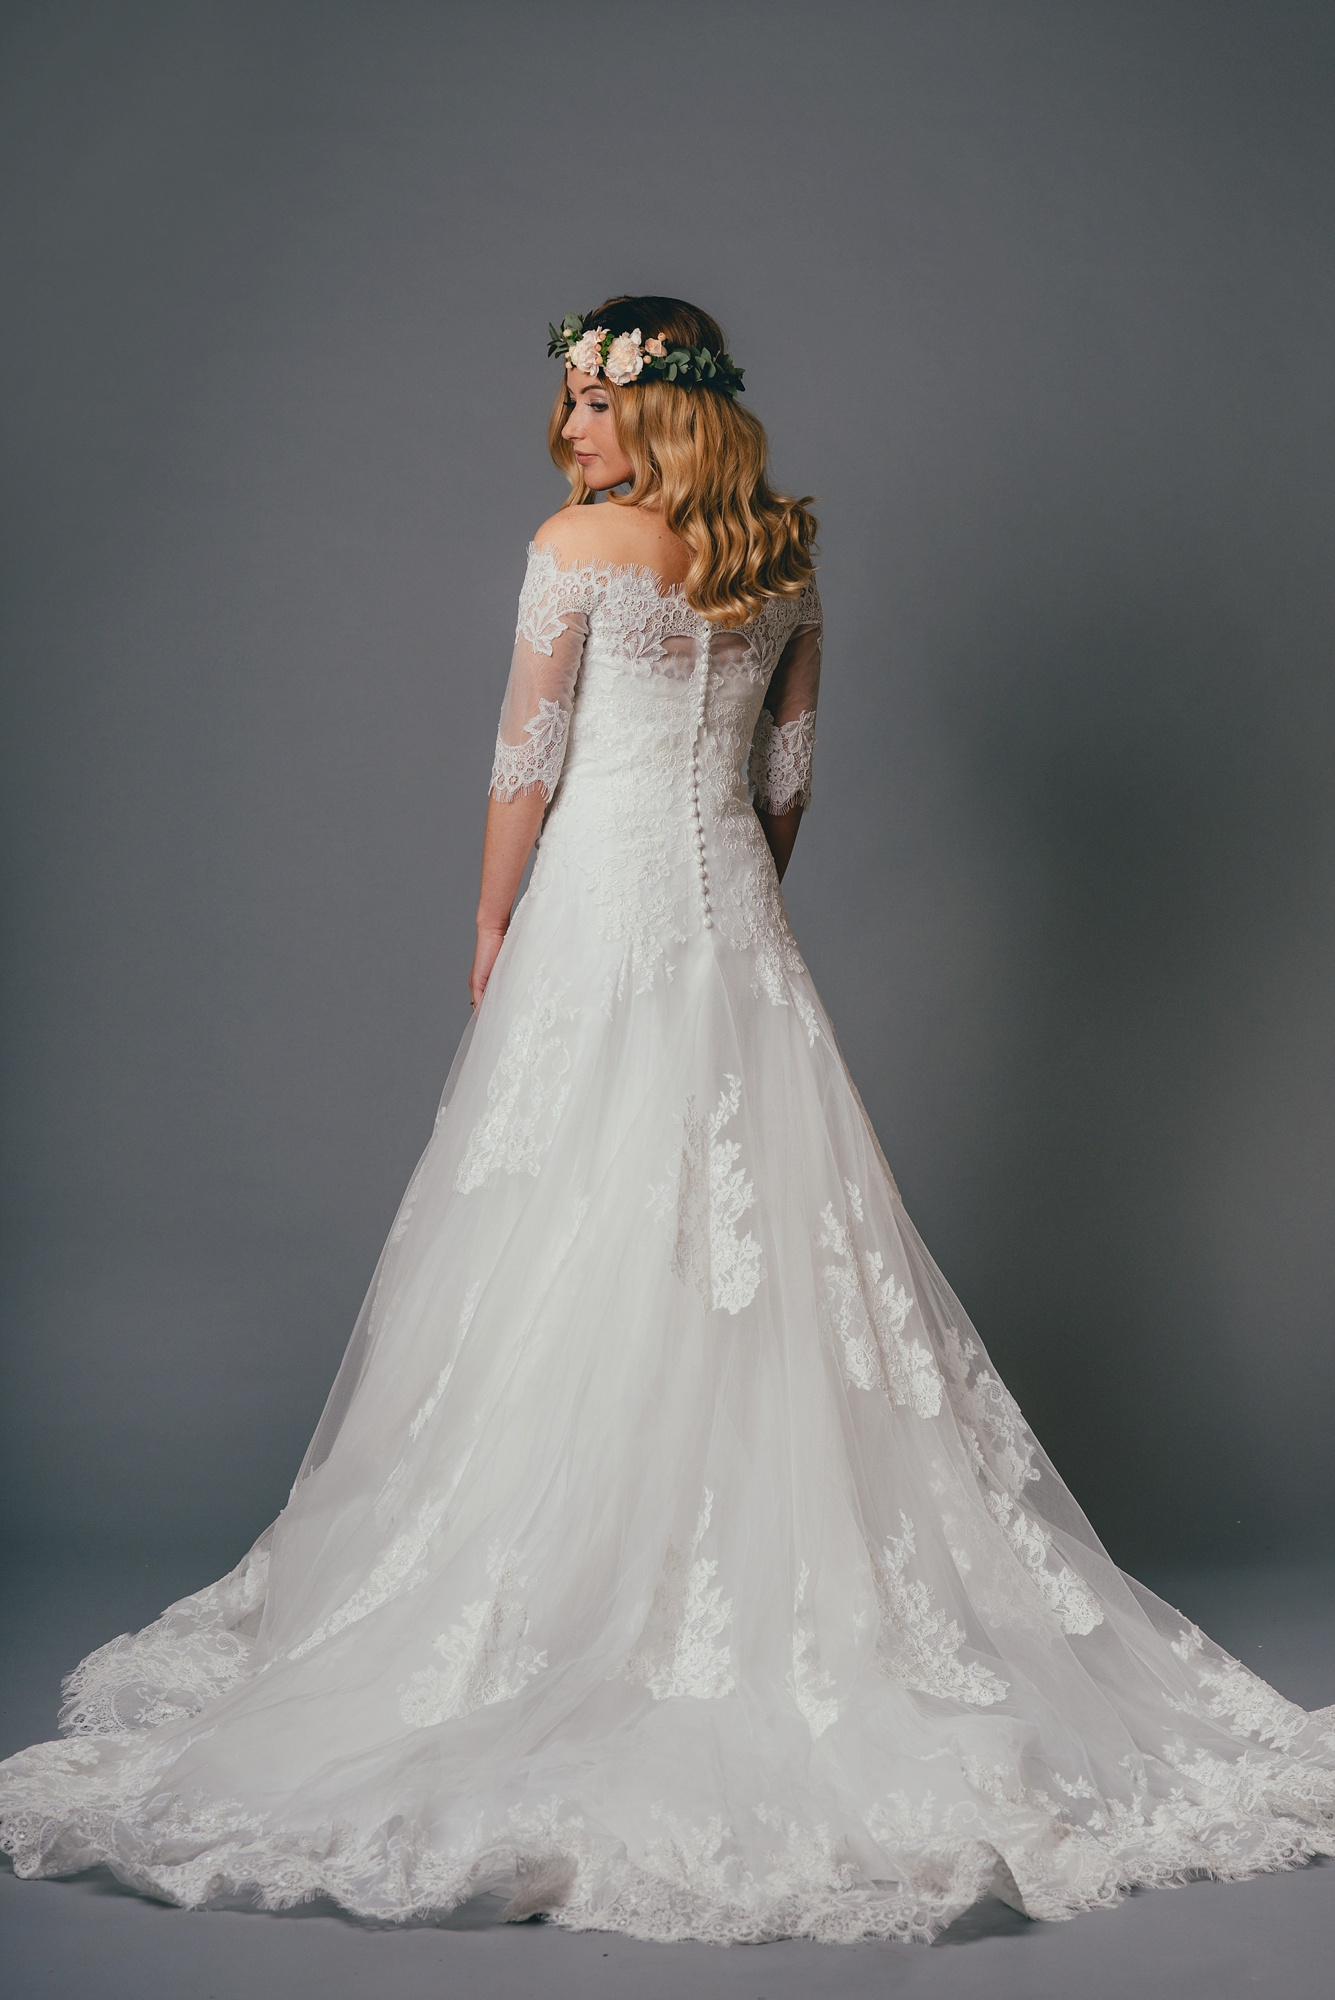 Wedding dress makers salisbury – Dress blog Edin